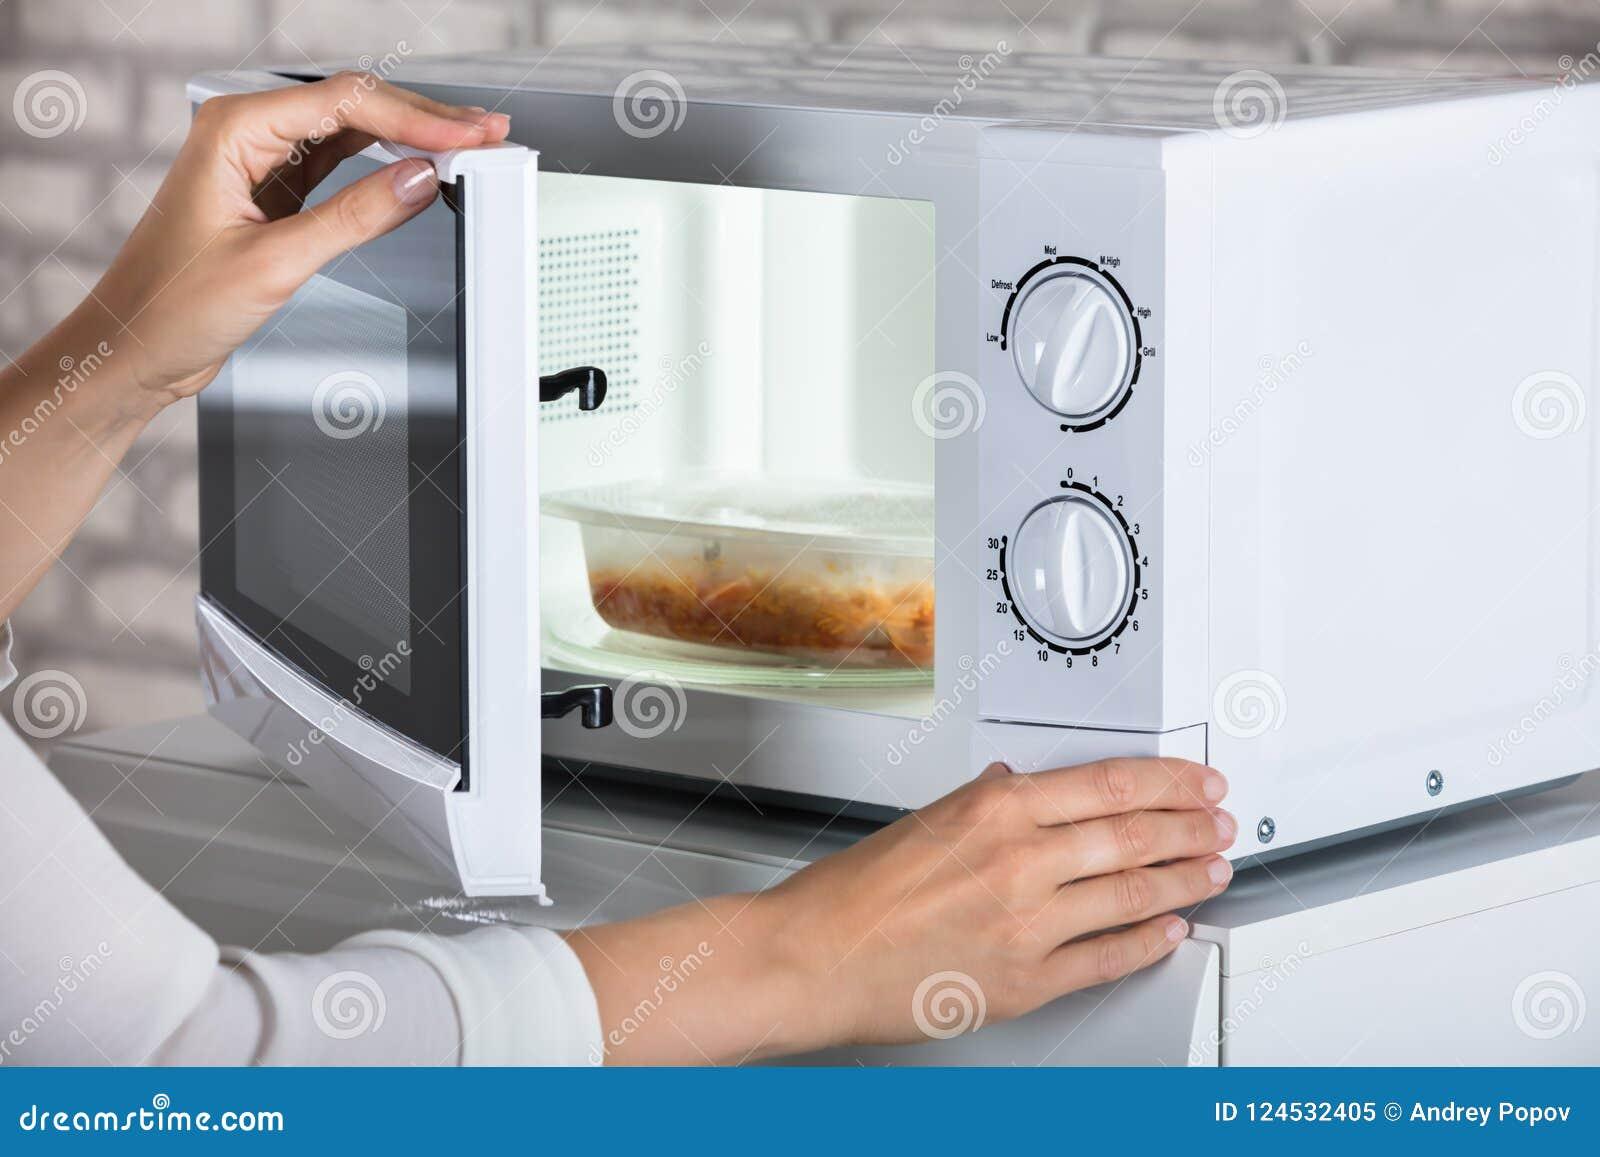 Woman`s Hands Closing Microwave Oven Door And Preparing Food